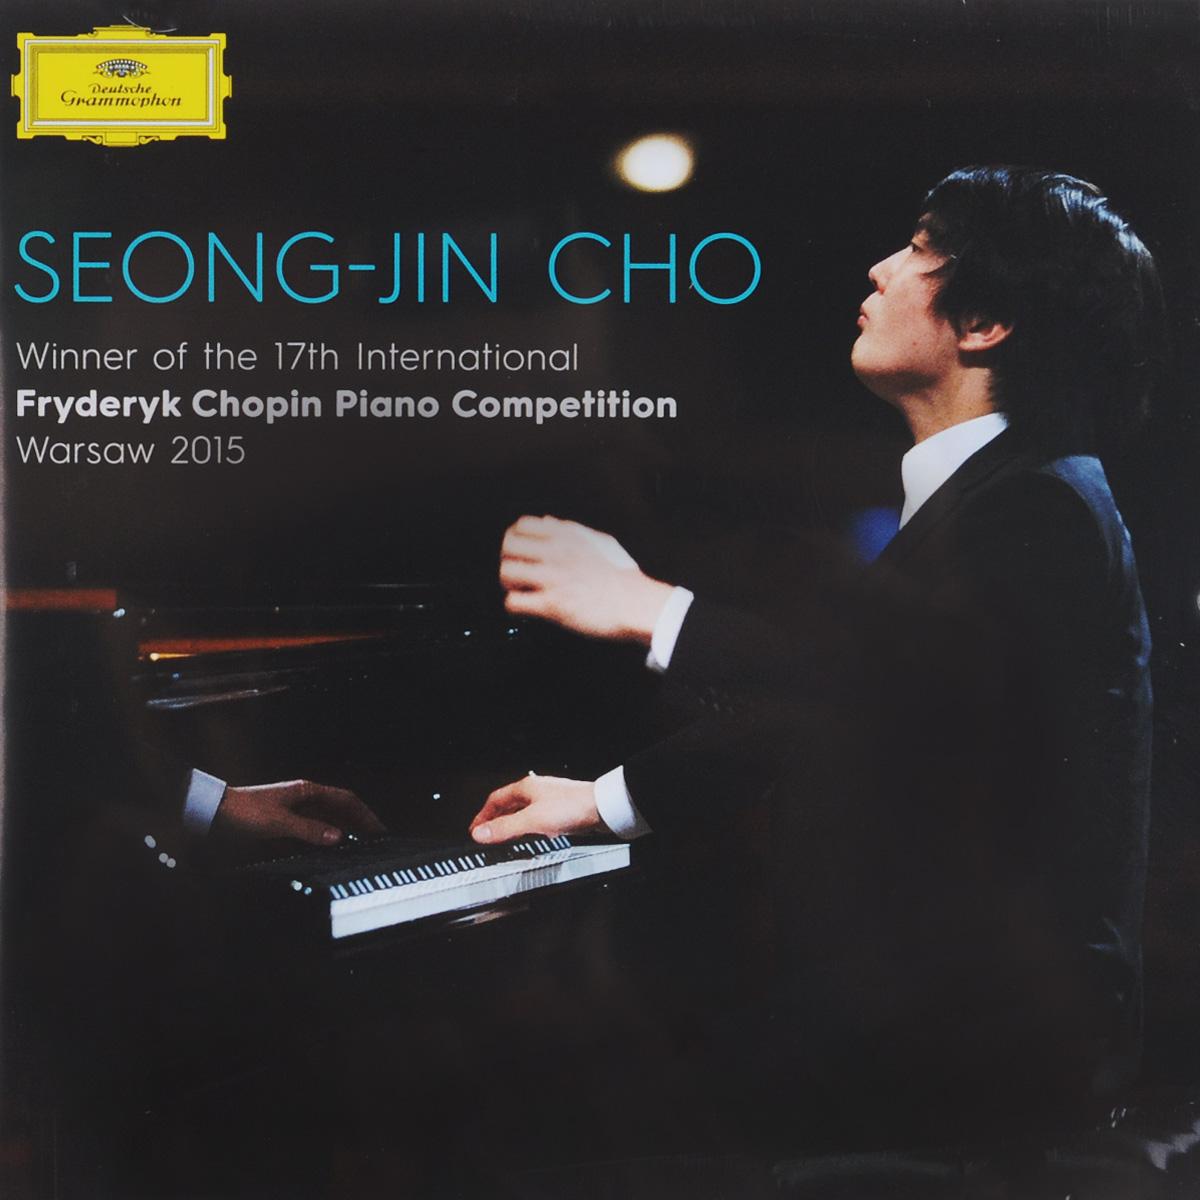 Сон Чжин Чо Seong-Jin Cho. Chopin. Winner of 17th International Chopin Piano Competition Warsaw 2015. Live chopin chopincho seong jin piano concerto no 1 ballades 2 lp